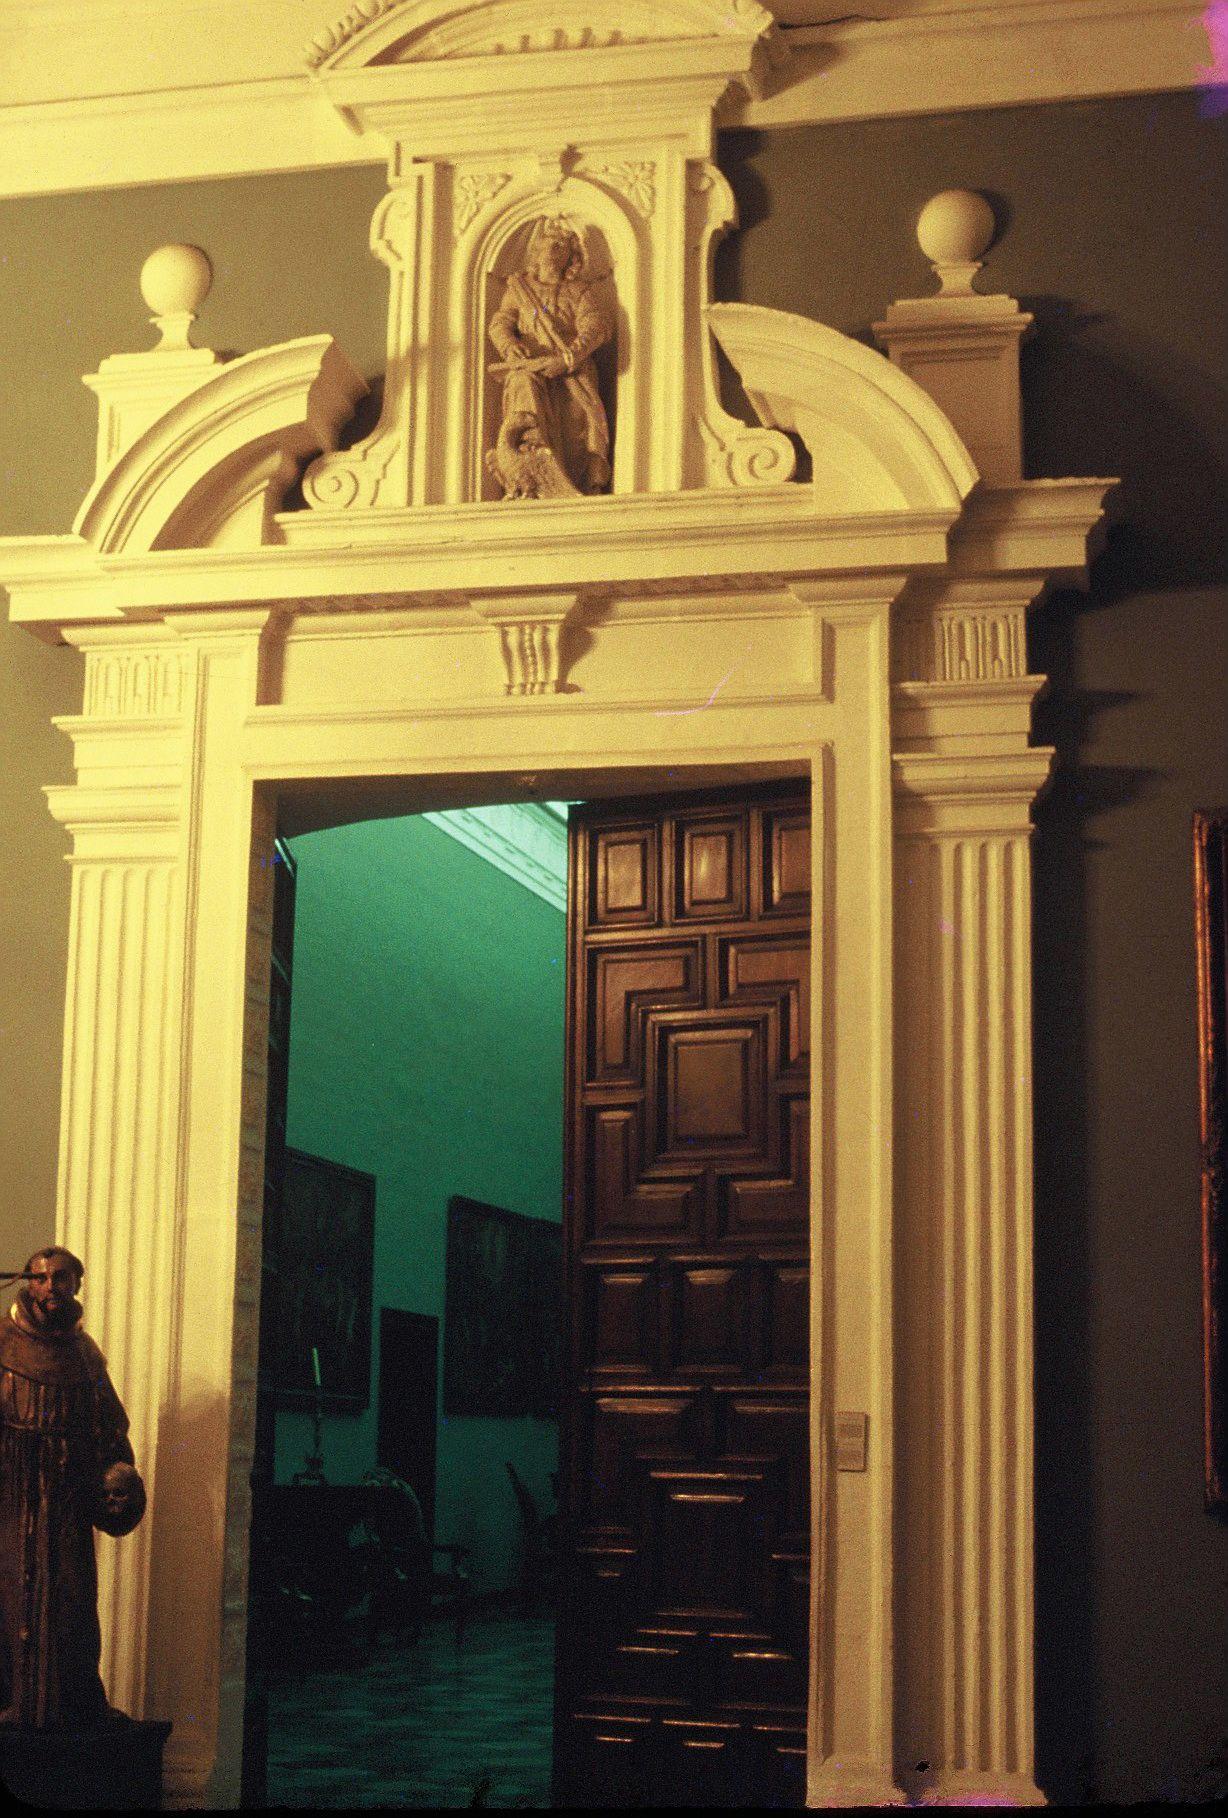 La Catedral Portada De La Sacristía Universidad Católica Sedes Sapientiae Home Decor Decor Home